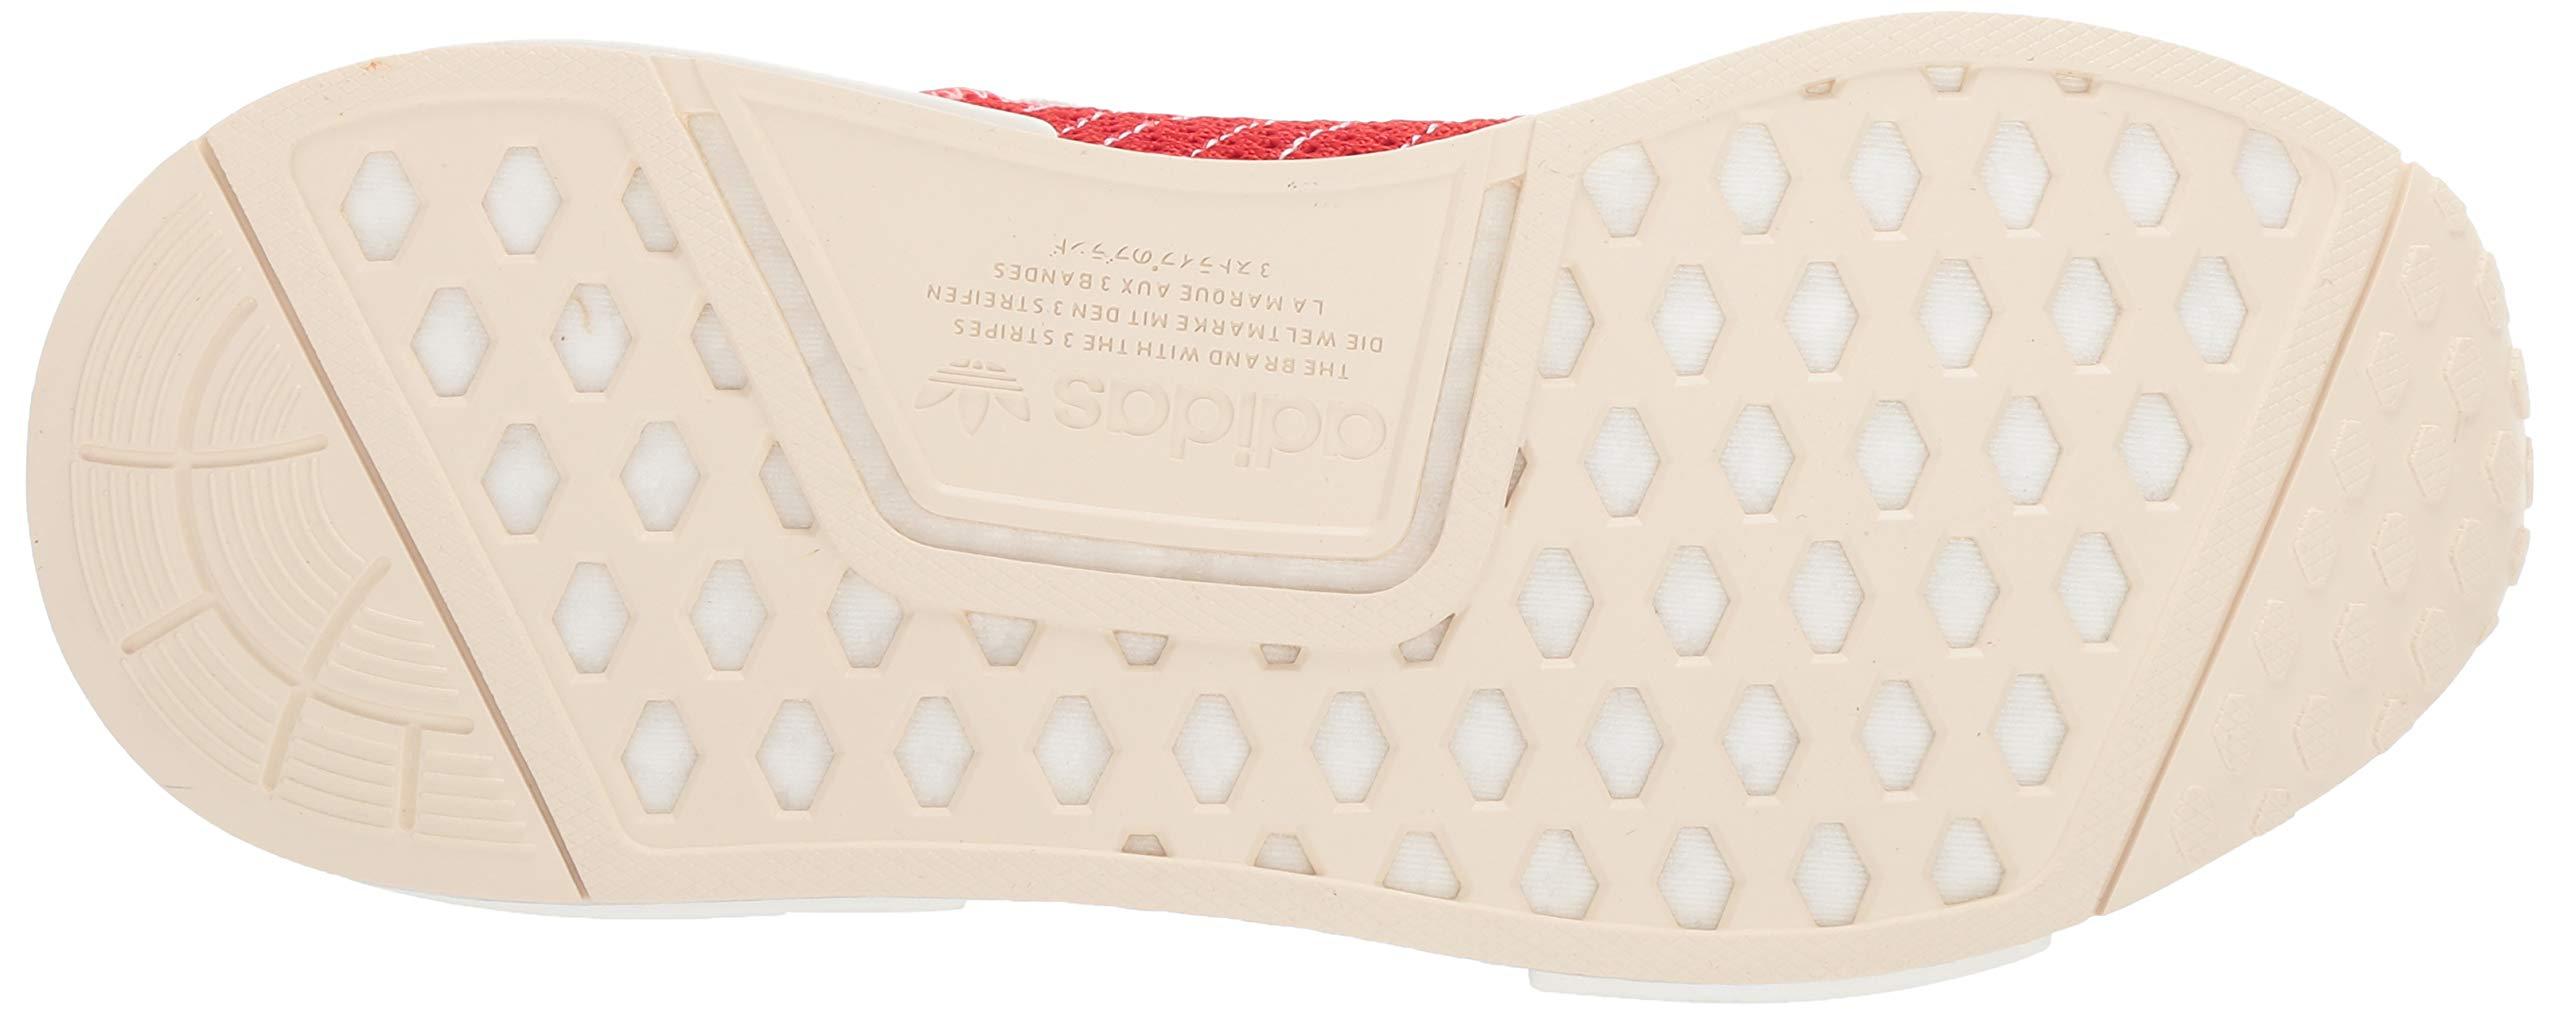 adidas Originals Men's NMD_R1 Running Shoe, Active red/Ecru Tint, 4 M US by adidas Originals (Image #3)